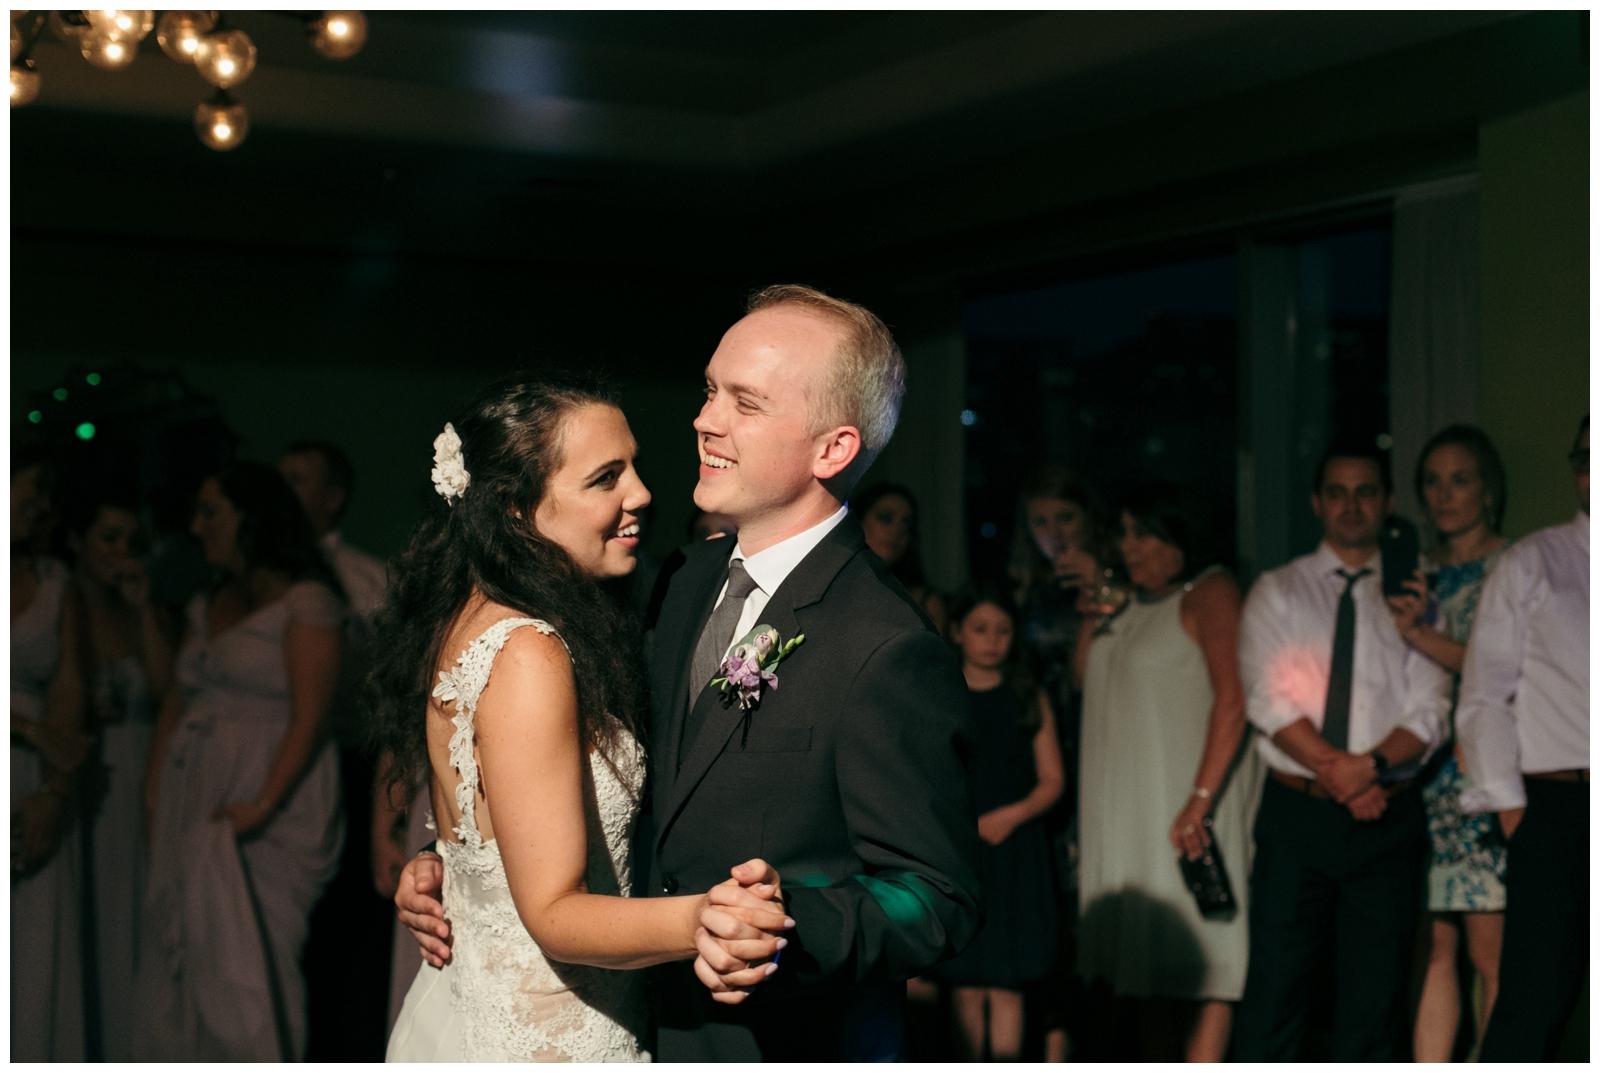 Bailey-Q-Photo-Royal-Sonesta-Boston-Wedding-Photographer-075.jpg